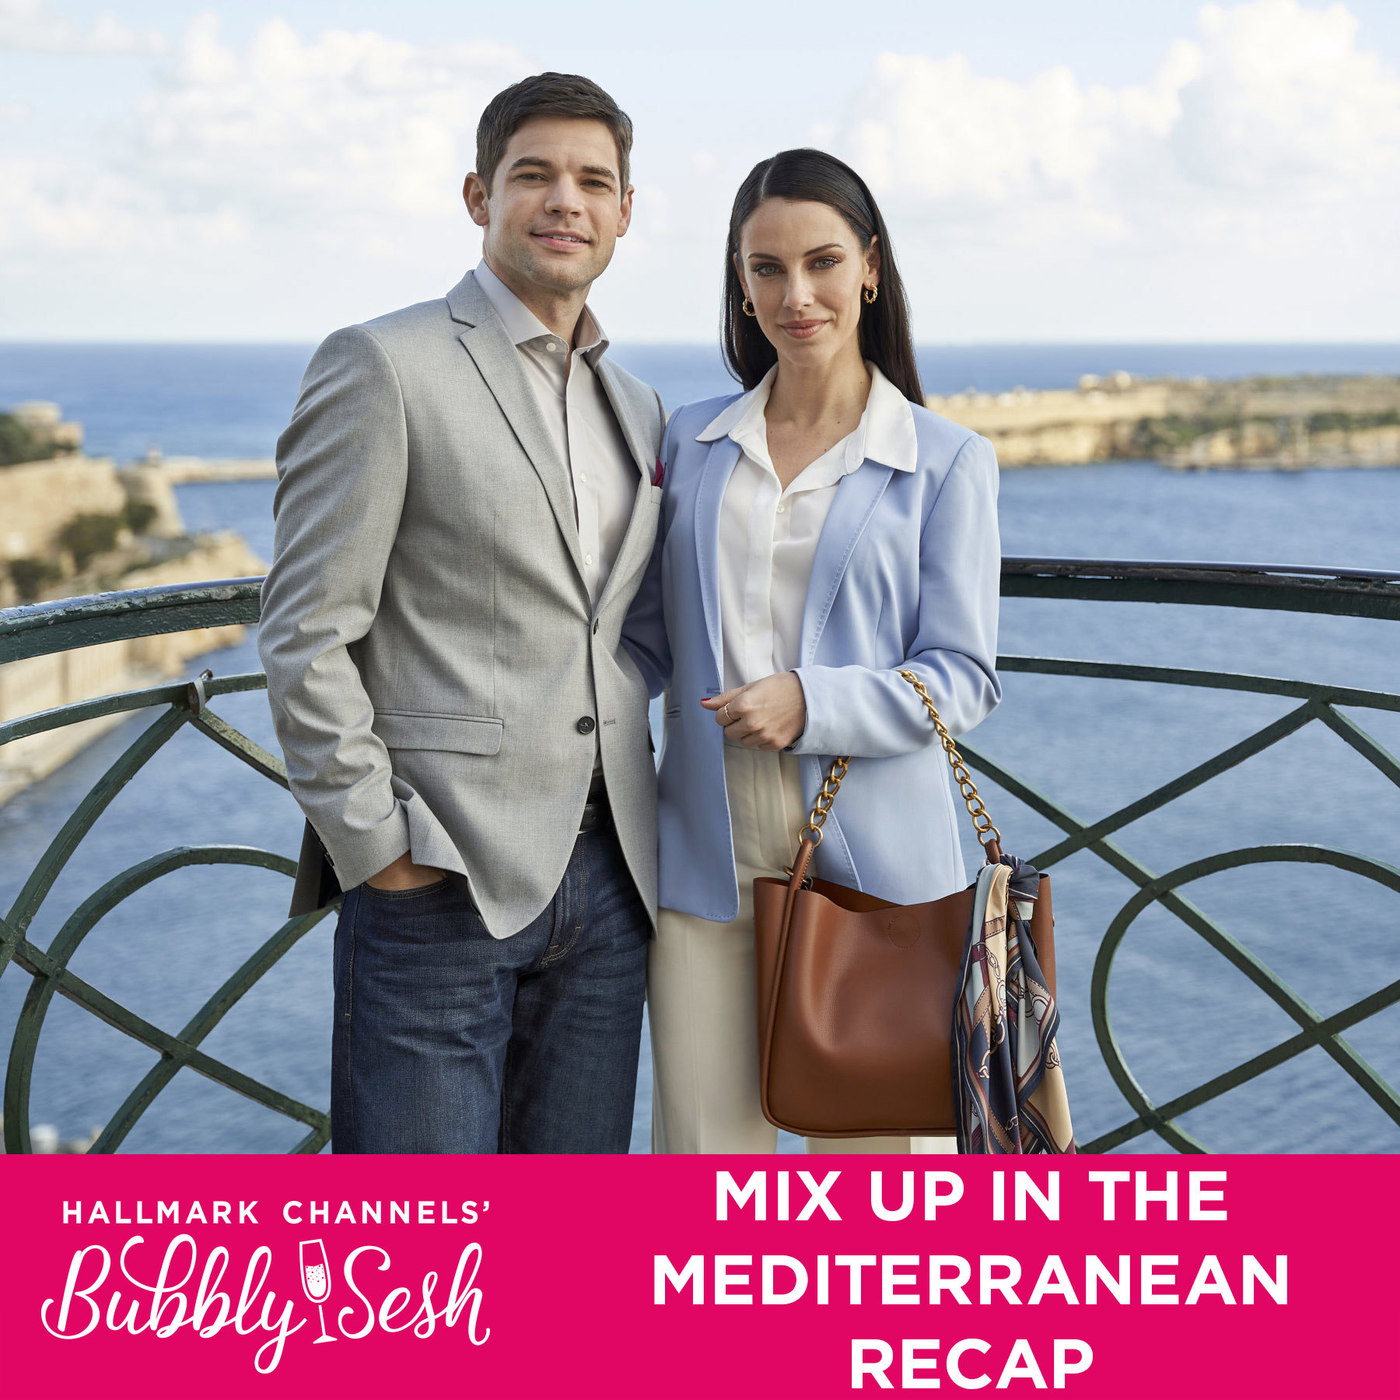 Mix Up in the Mediterranean Recap